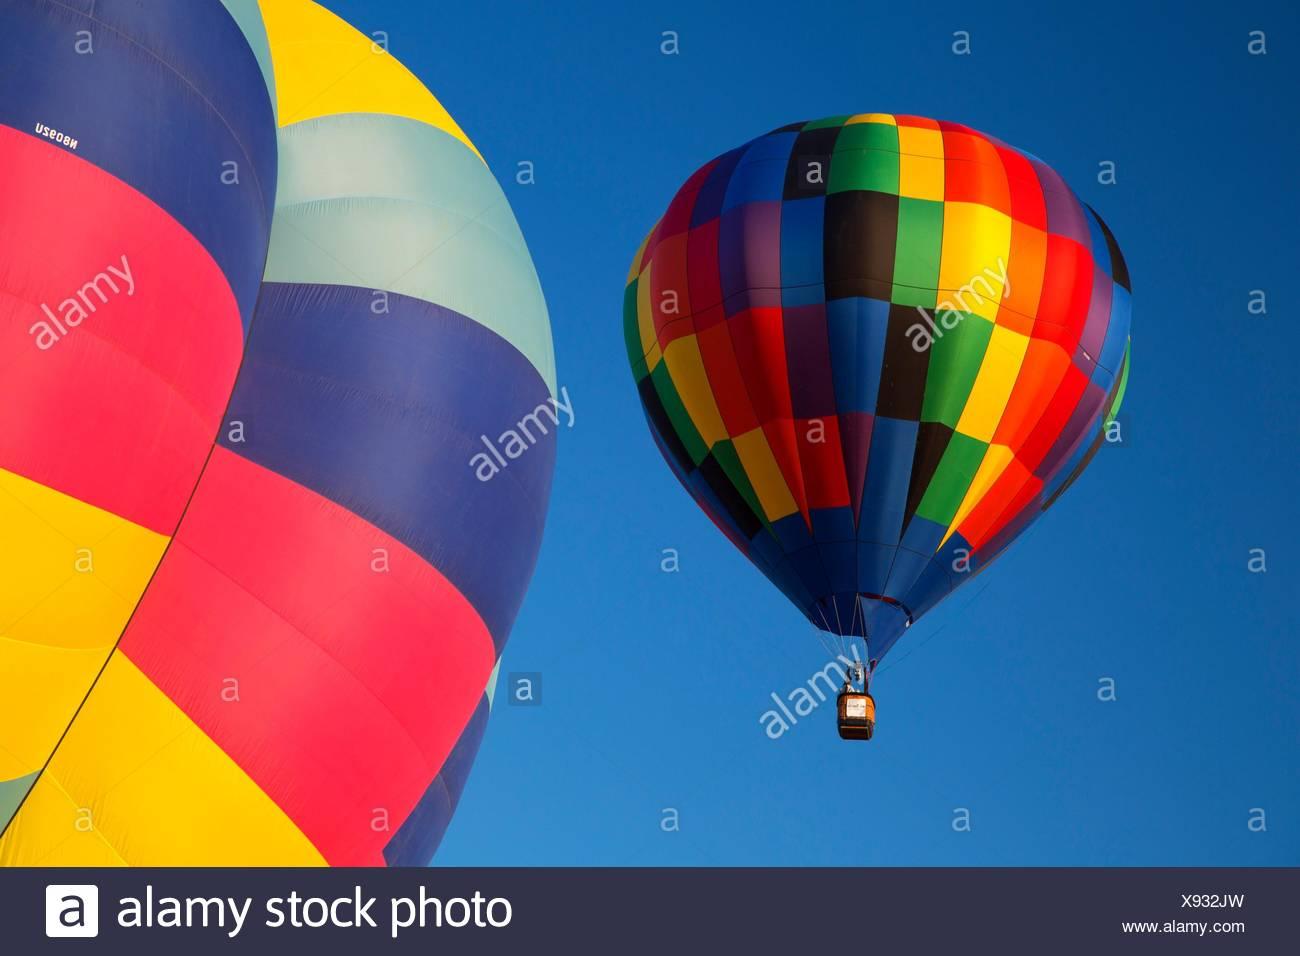 Hot air balloon, Northwest Art and Air Festival, Timber Linn Park, Albany, Oregon. - Stock Image